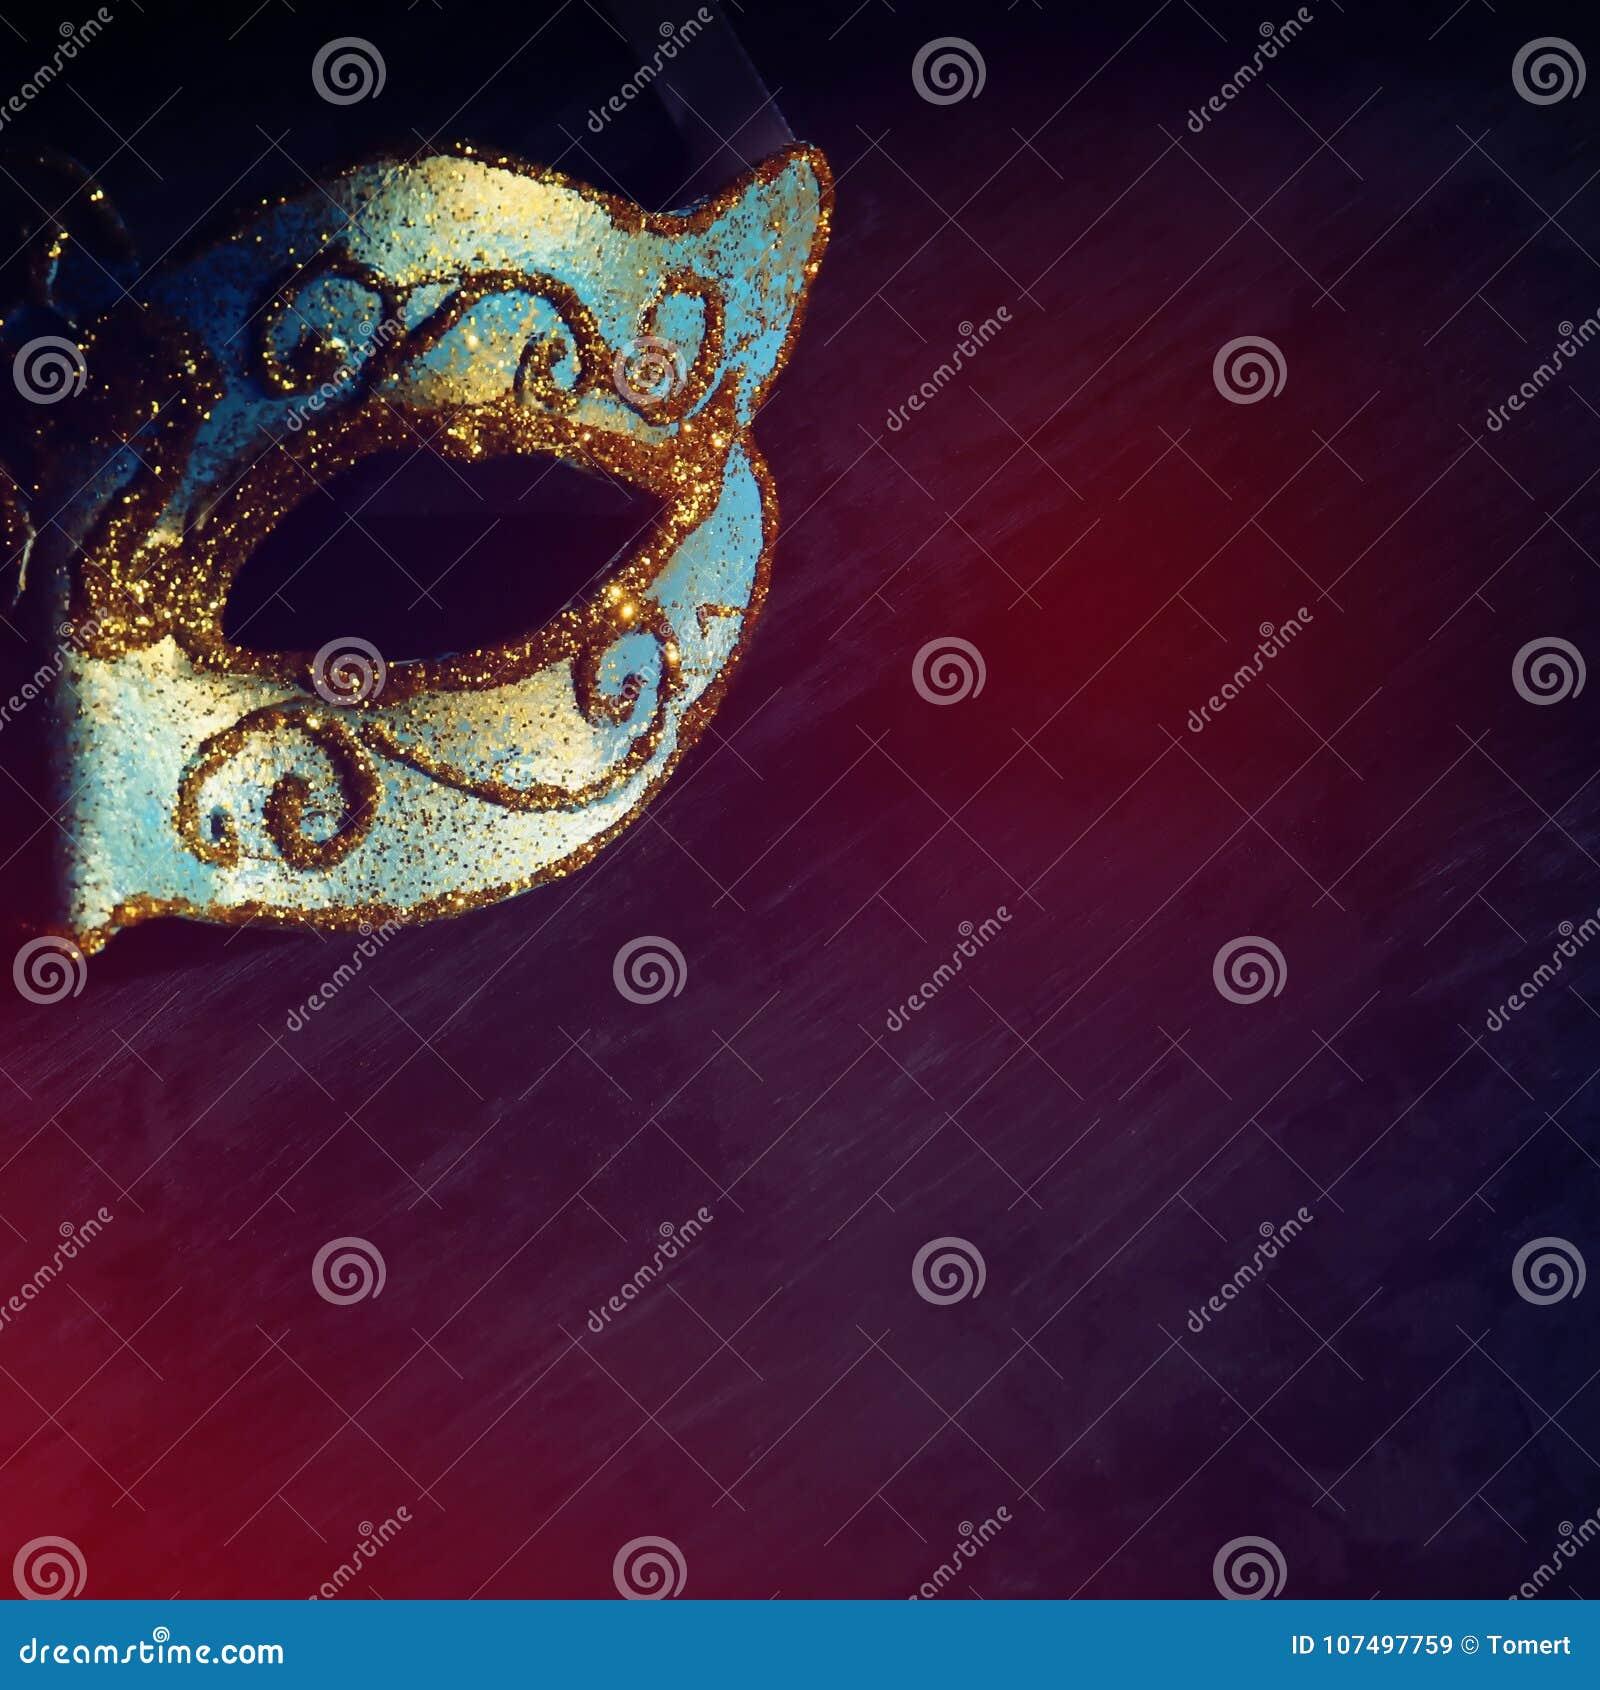 Image of elegant blue and gold venetian, mardi gras mask over black background.